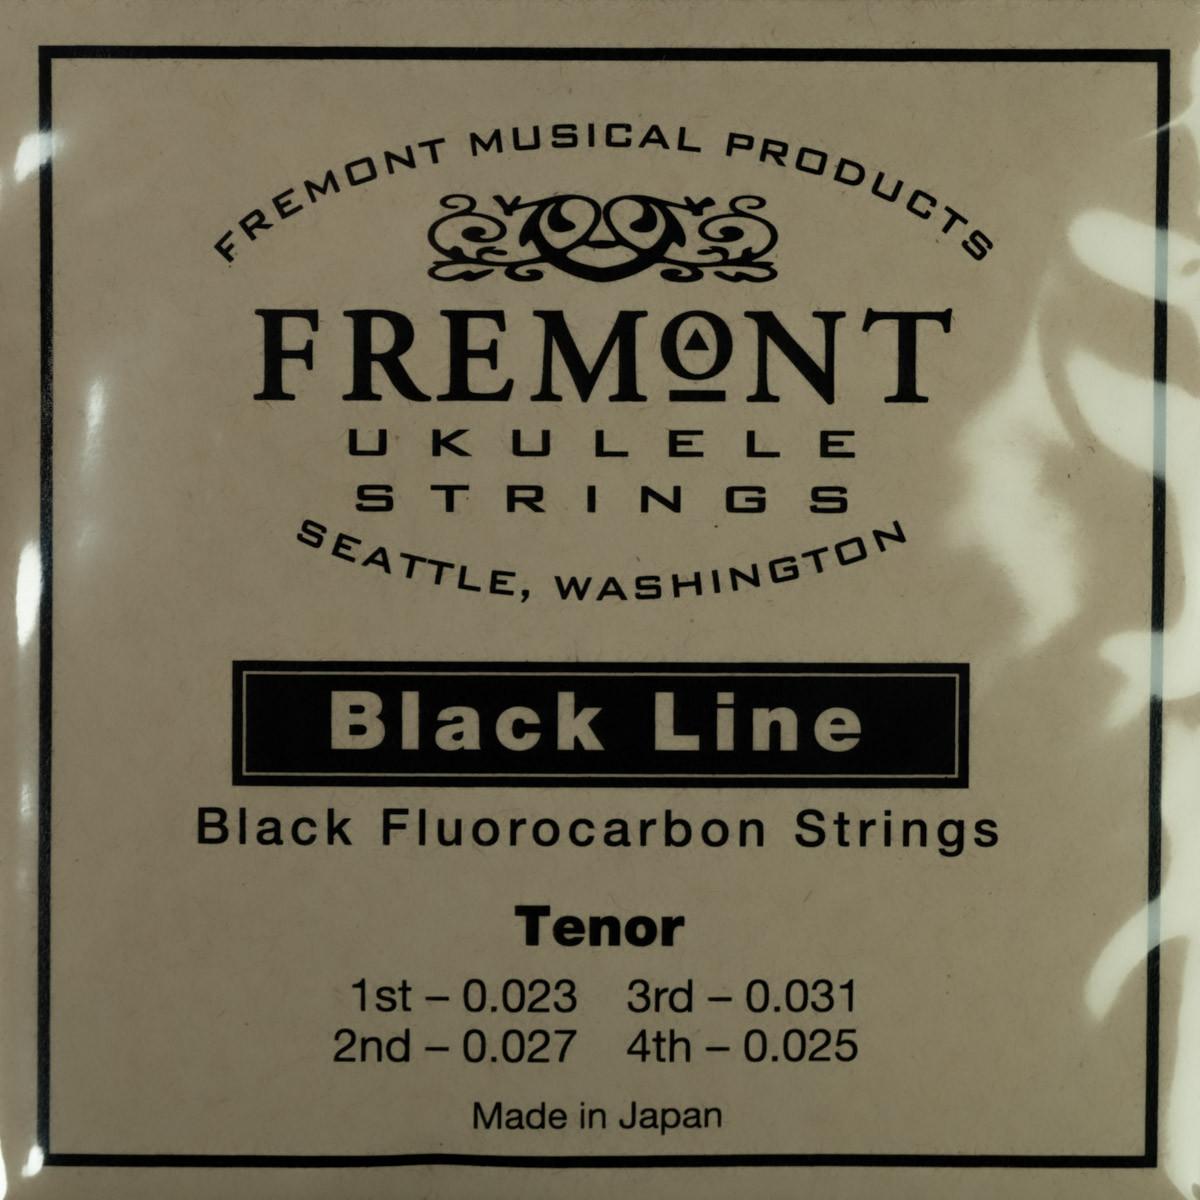 Fremont Ukulele Strings - Blackline-Tenor (High or Low G)